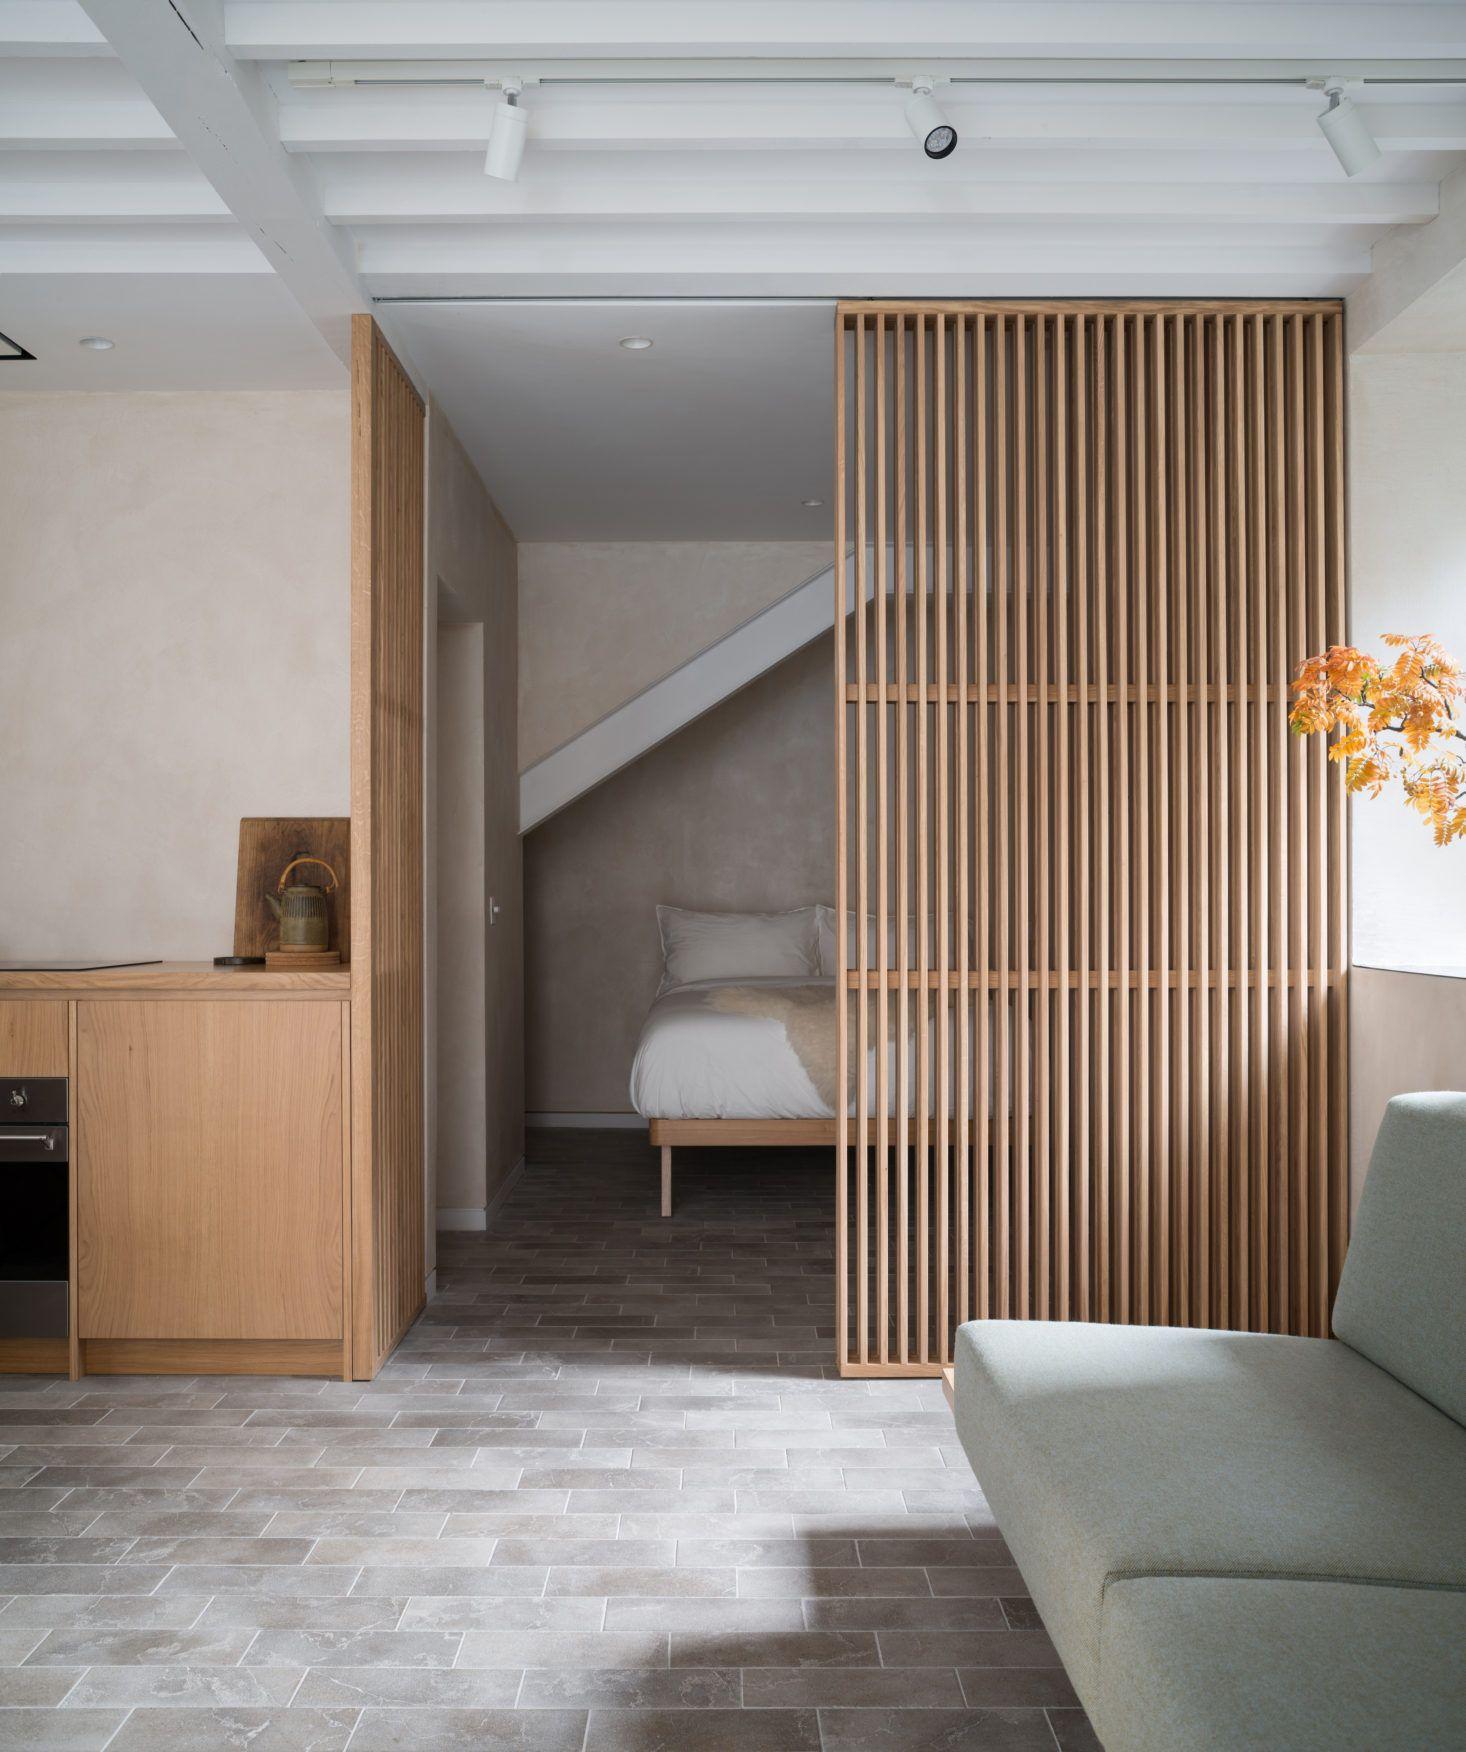 A Garage Converted into a Stylish Studio Apartment: Porteous Studio Vacation Rental in Edinburgh